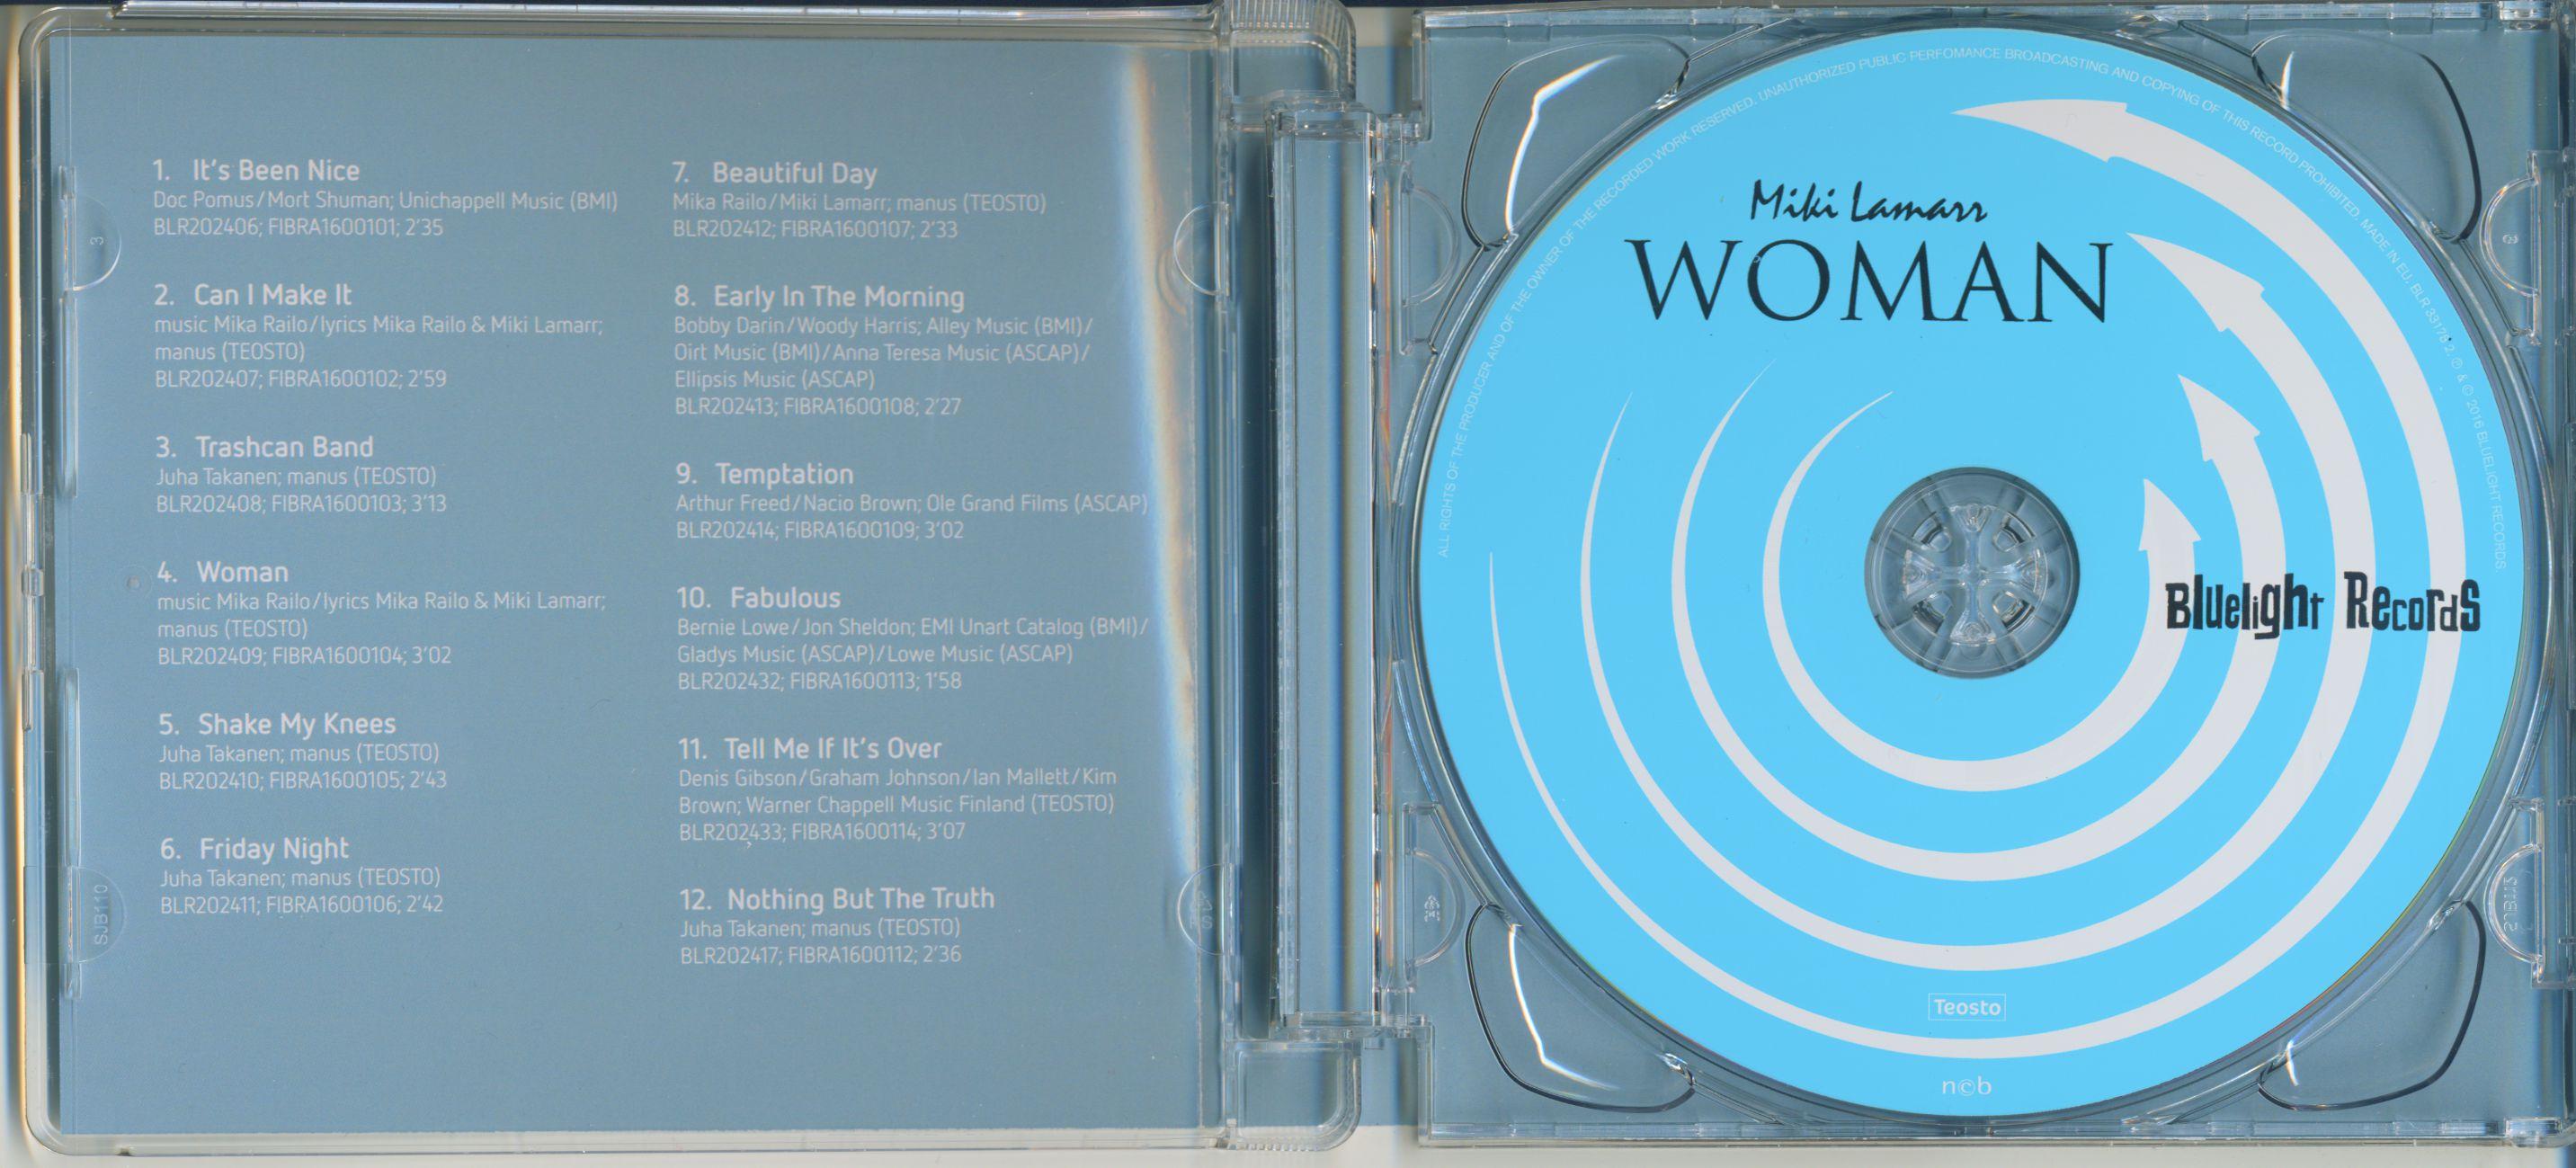 Miki Lamarr Woman (CD)